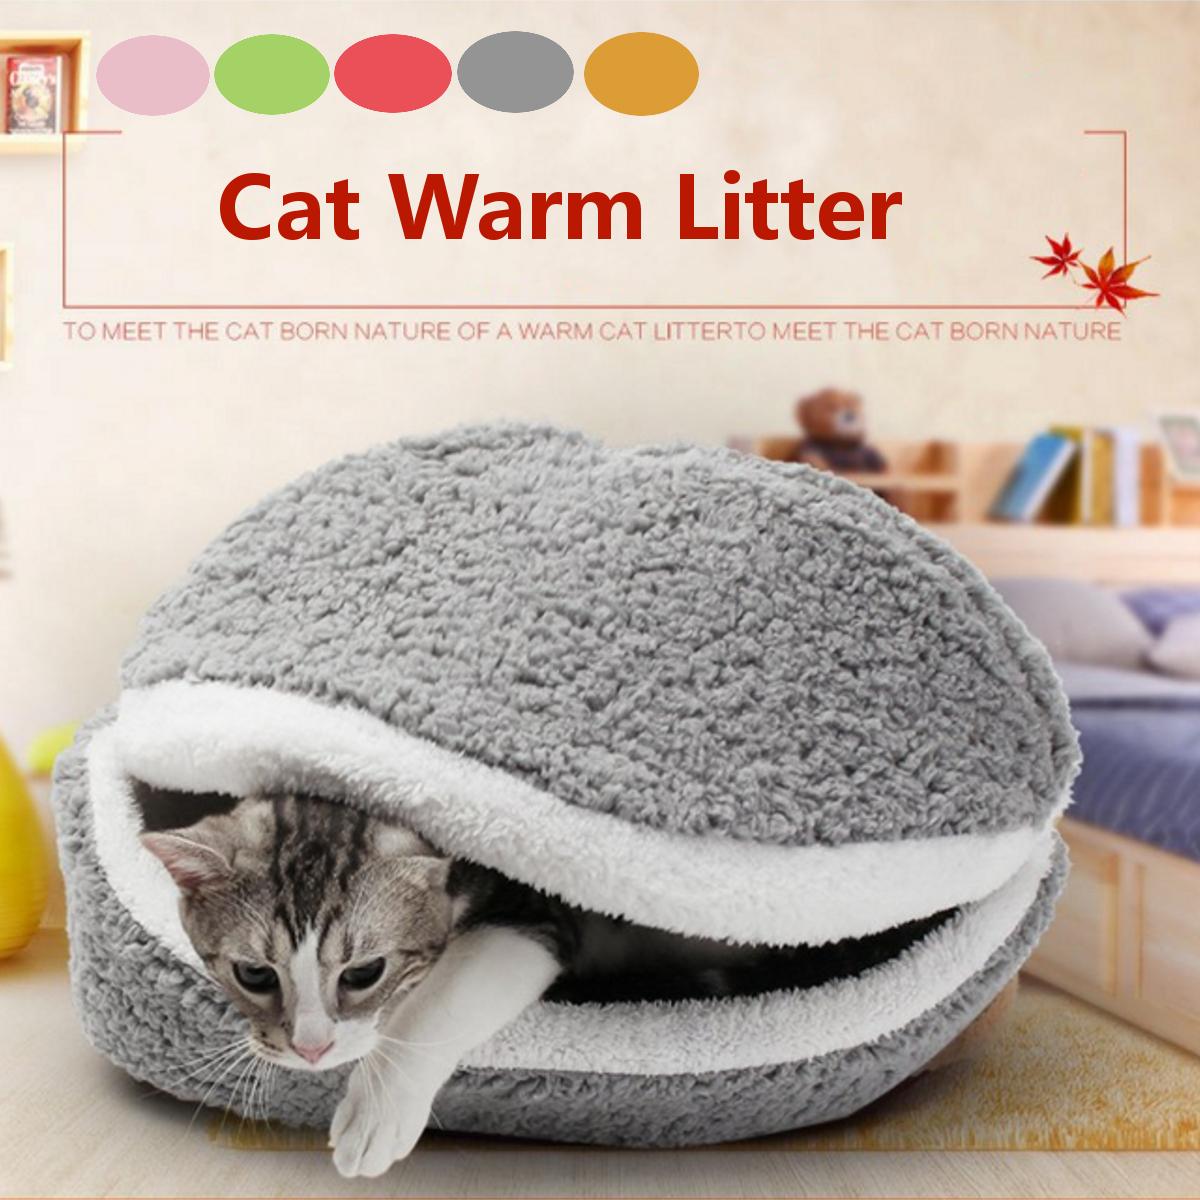 Washable Shell-shaped Burger Bun Soft Pet Bed Cat Bed Dog Sleeping Nest Bag Cave House Sleeping Bag Mat Pad Cushion 17*13*13inch